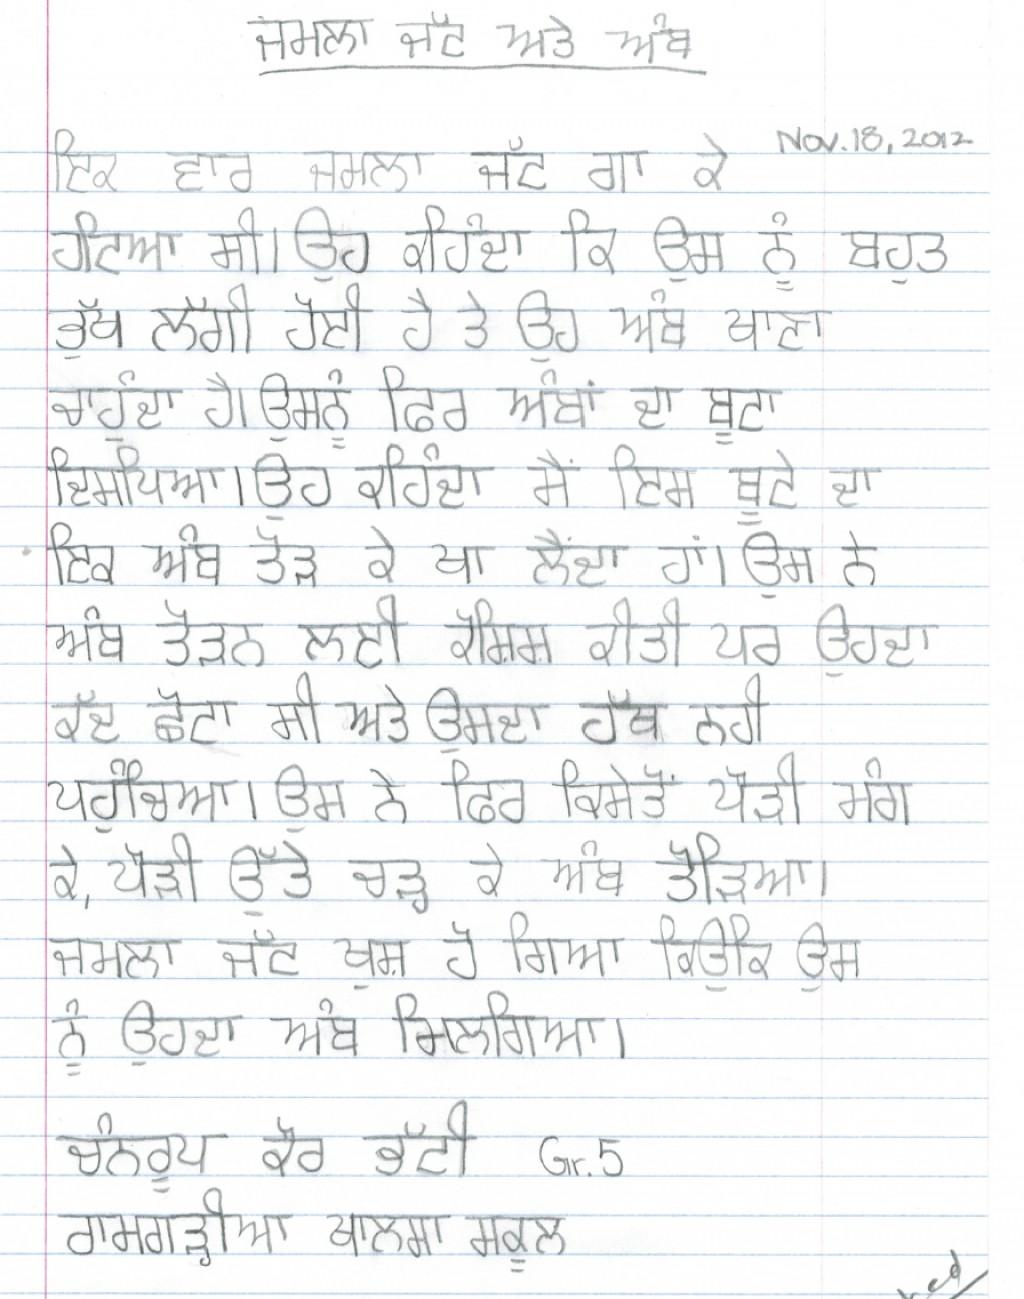 004 Qualities Of Good Friend Essay Screen252bshot252b2013 20252bat252b3 36252bpm Exceptional A In Hindi Short Large